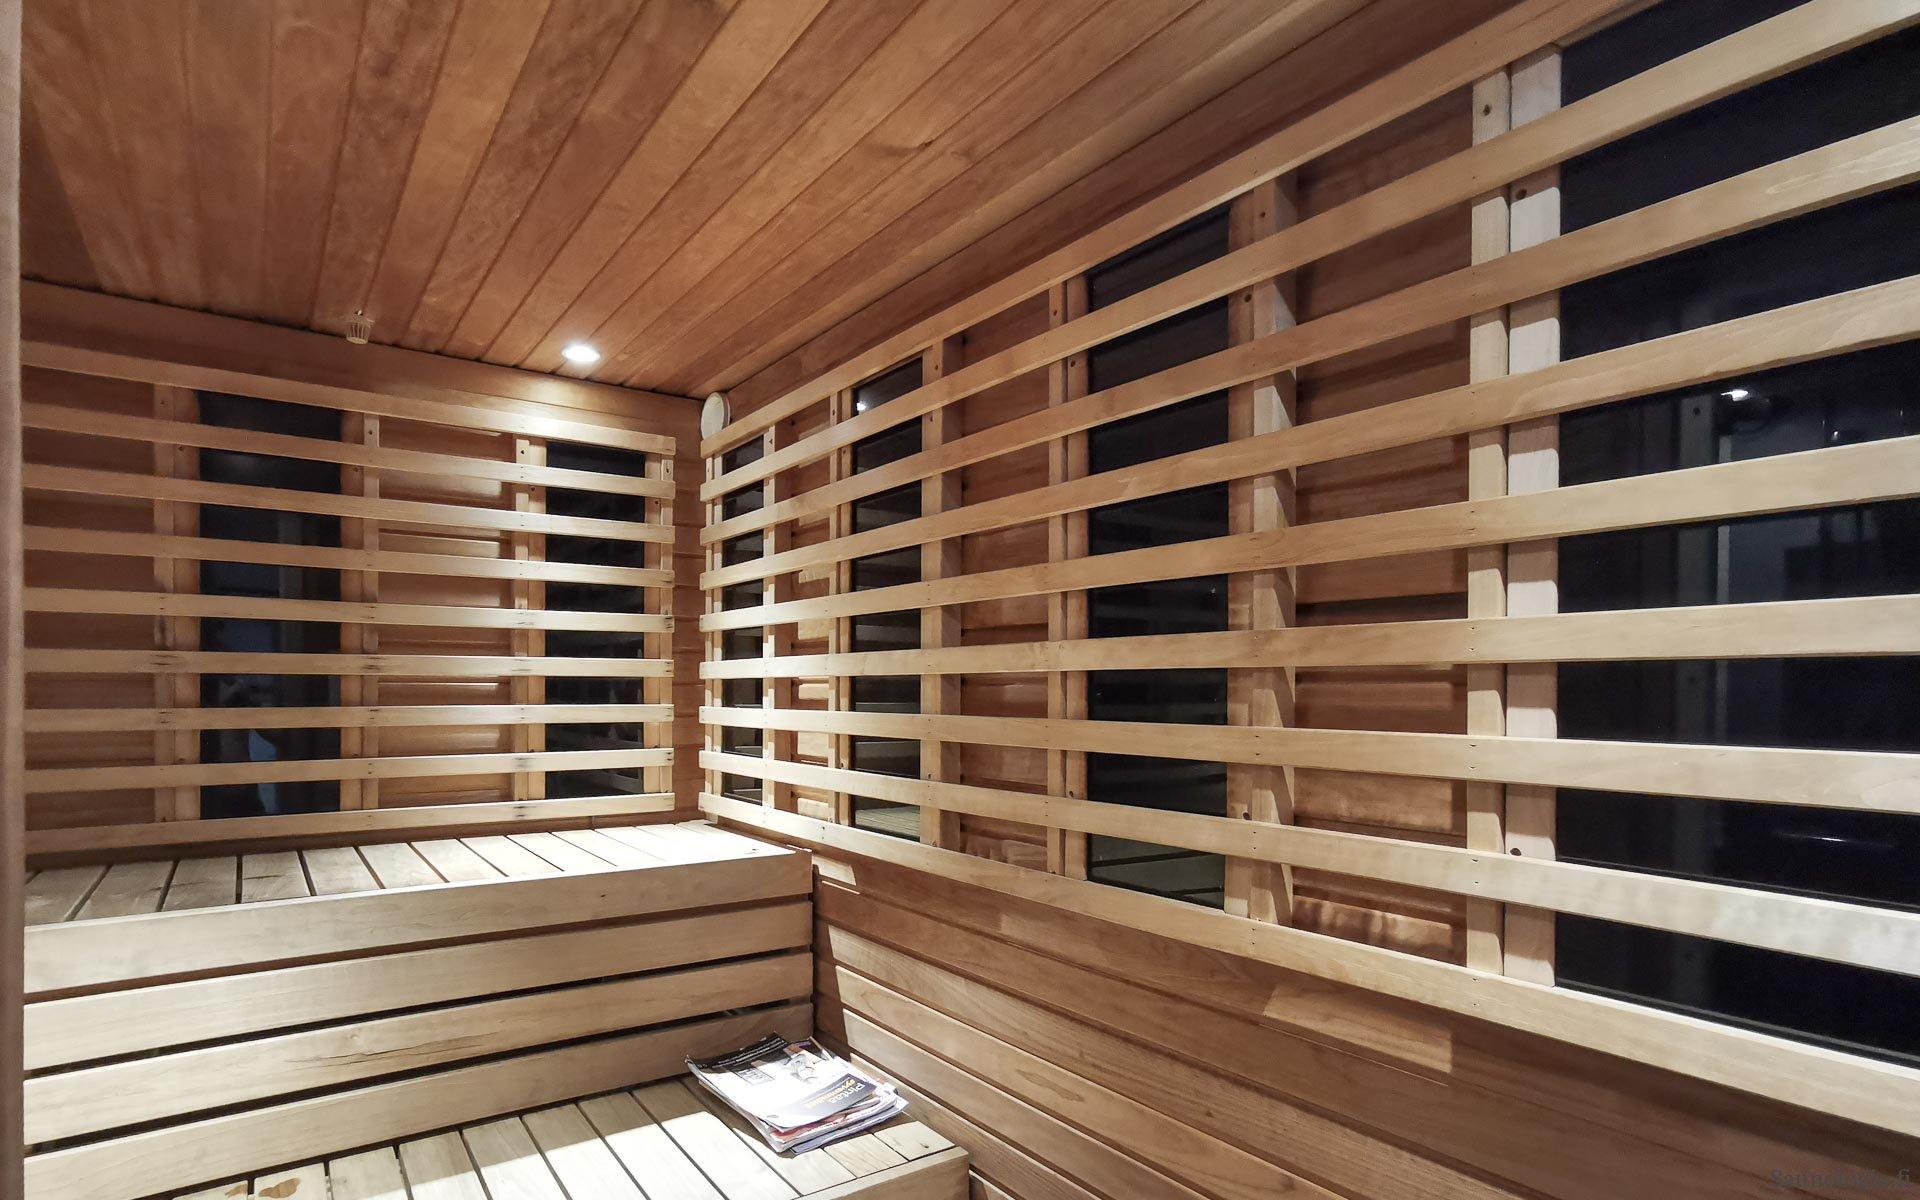 191106-ir-sauna-fressi-ovelta-161417